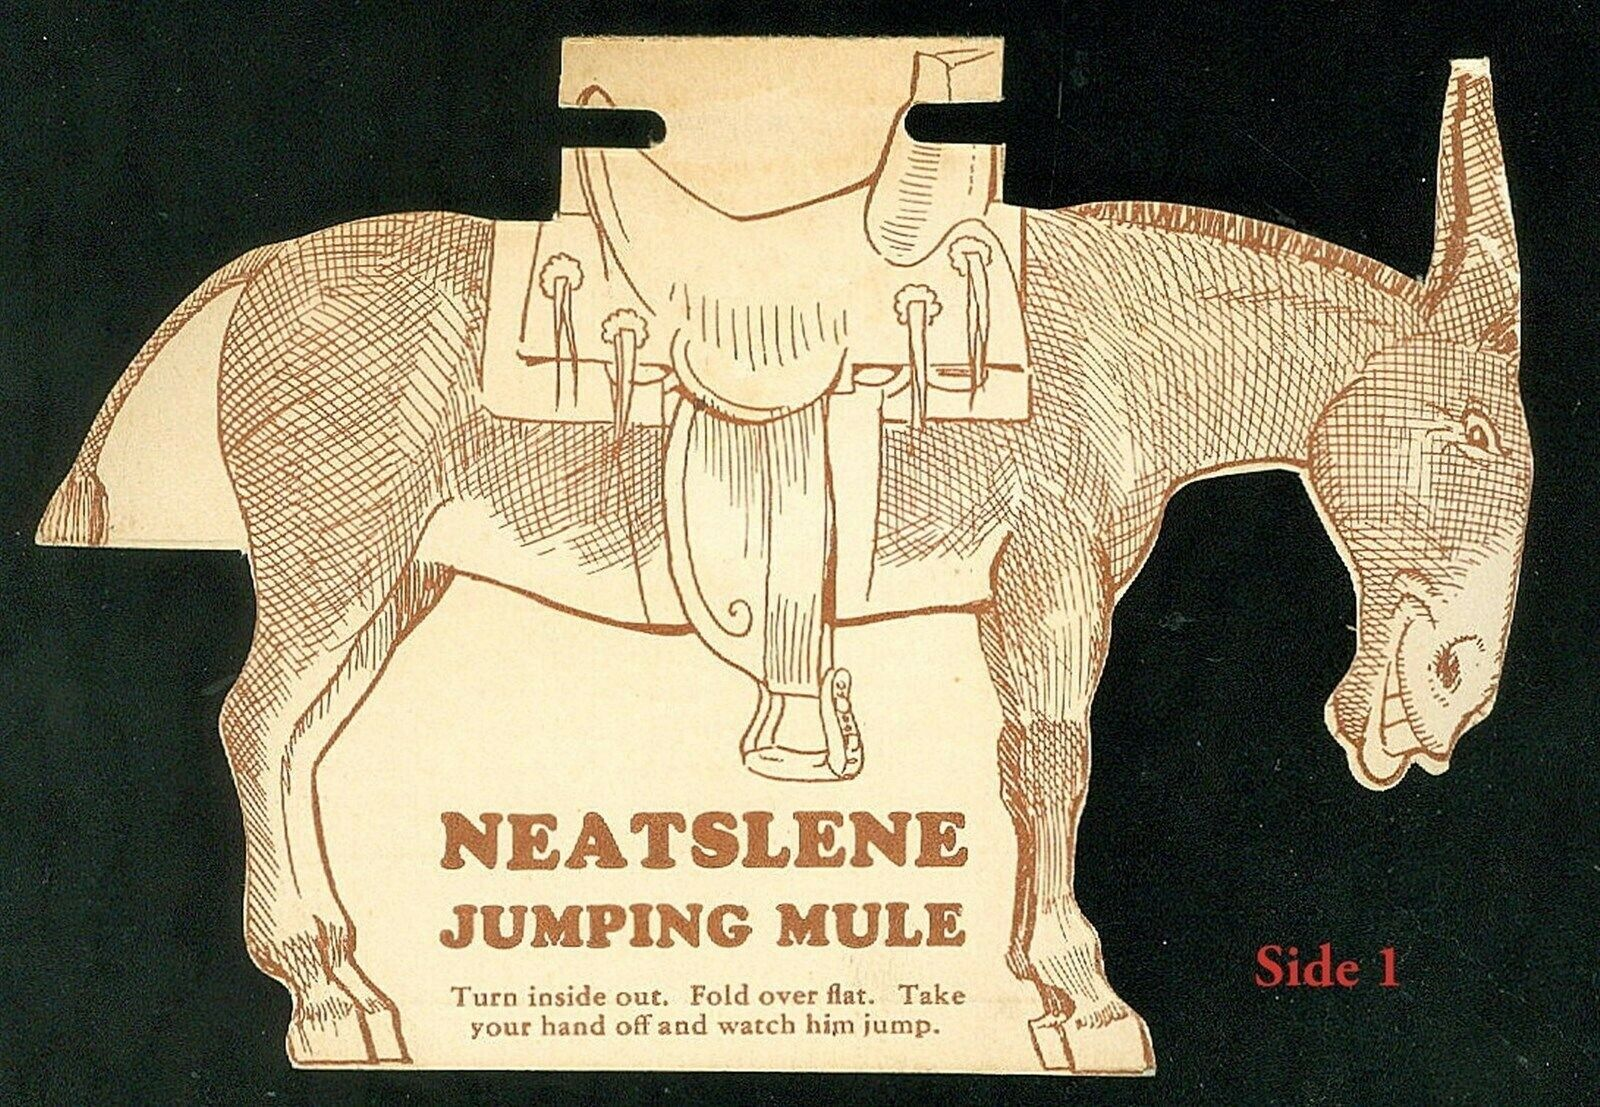 Die-cut Neatslene Jumping Mule - Make the Mule Jump  - Harness Oil